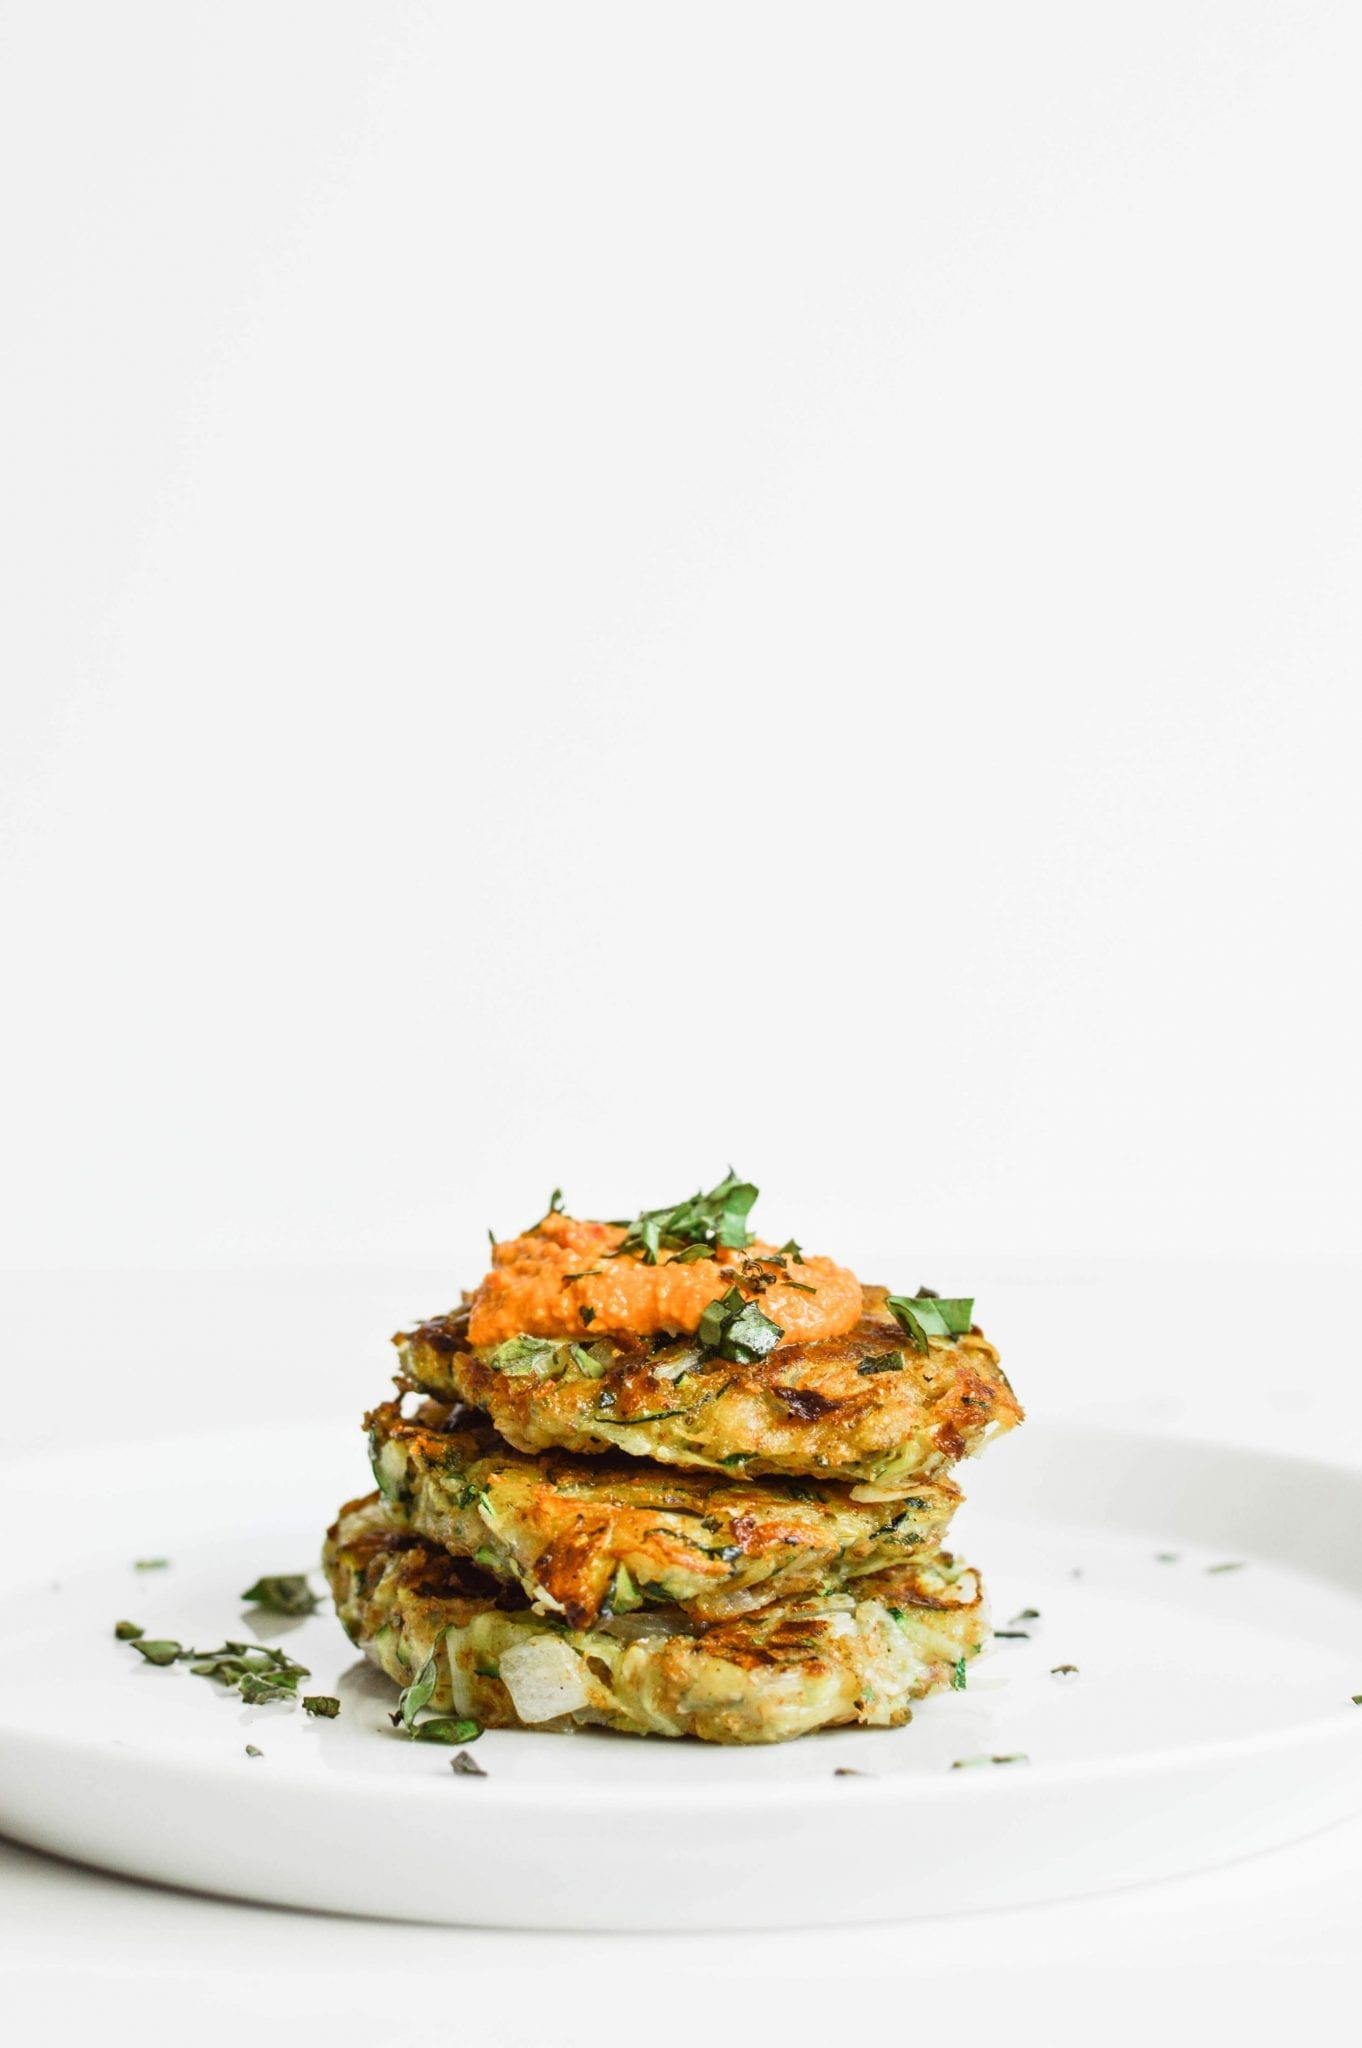 25-minute Healthy Zucchini Potato Fritters   Vegan   Gluten-Free   Soy-Free